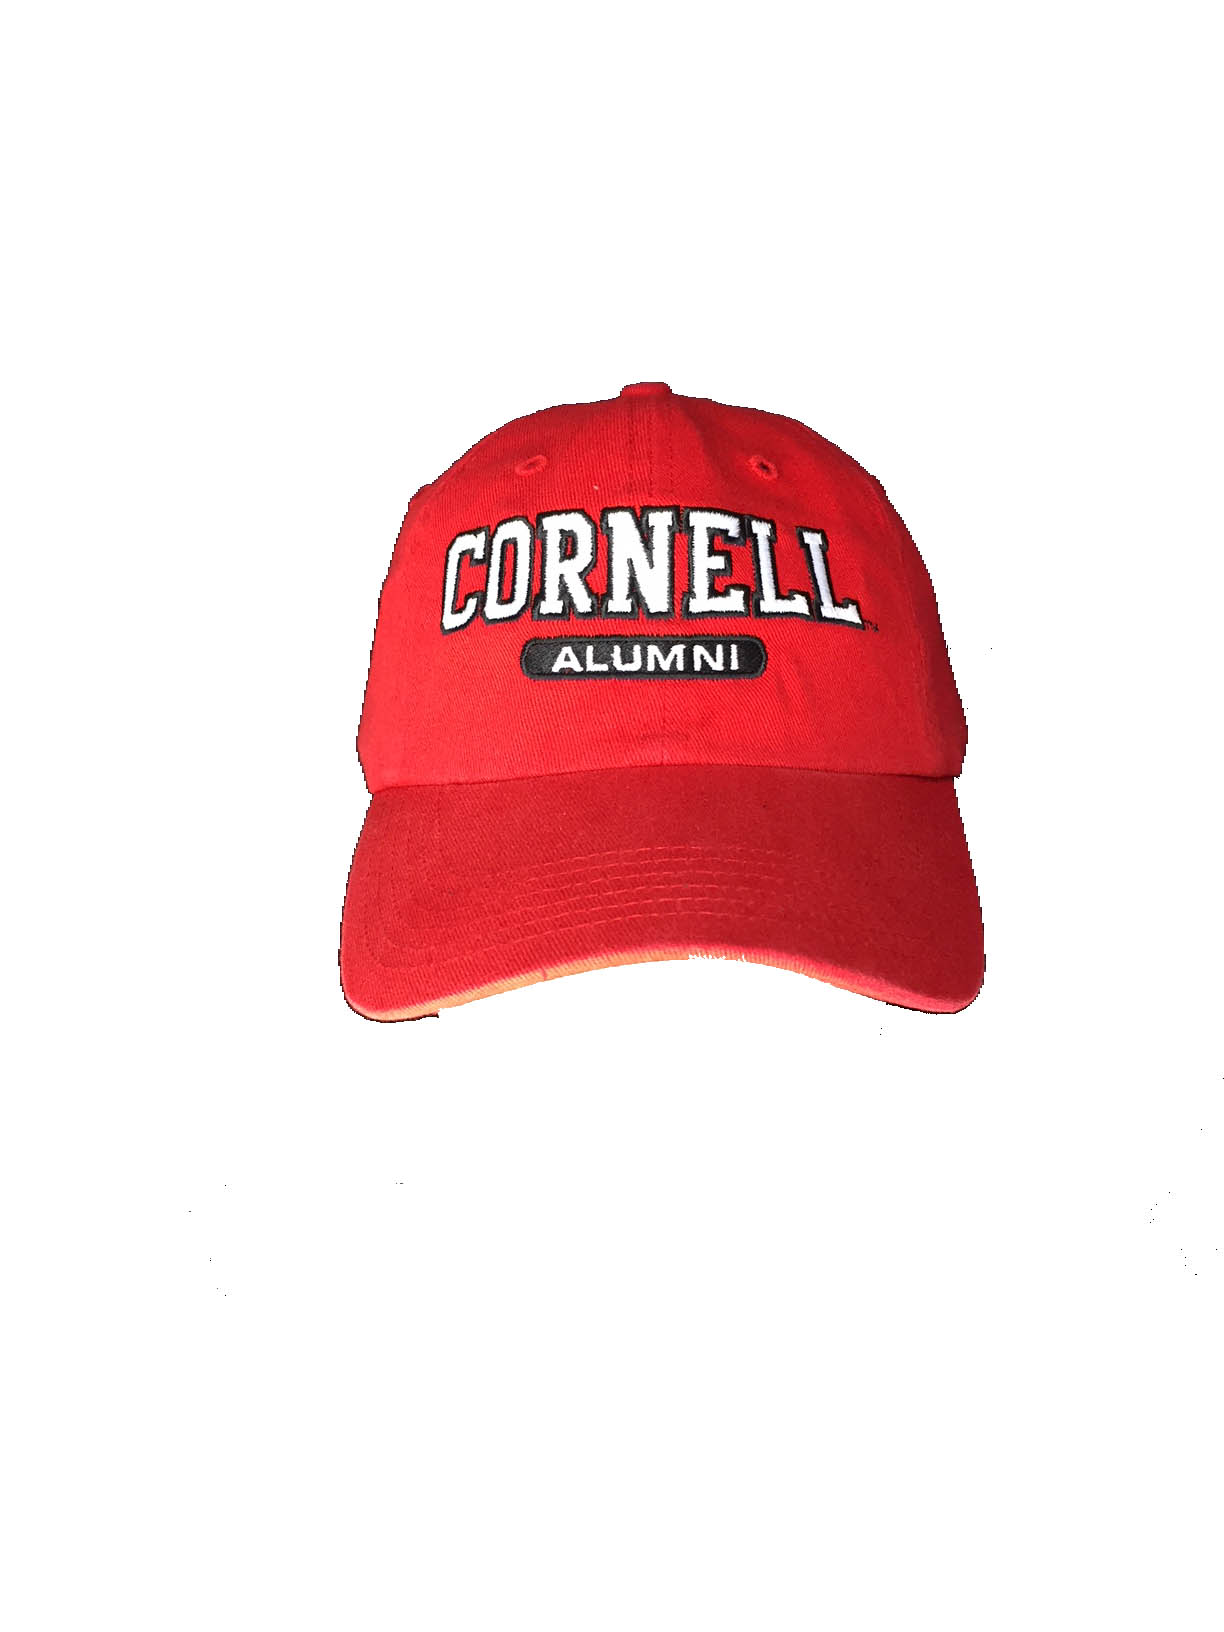 2fdcc982701 Cornell alumni hat bear necessities online store jpg 1224x1632 Cornell hat